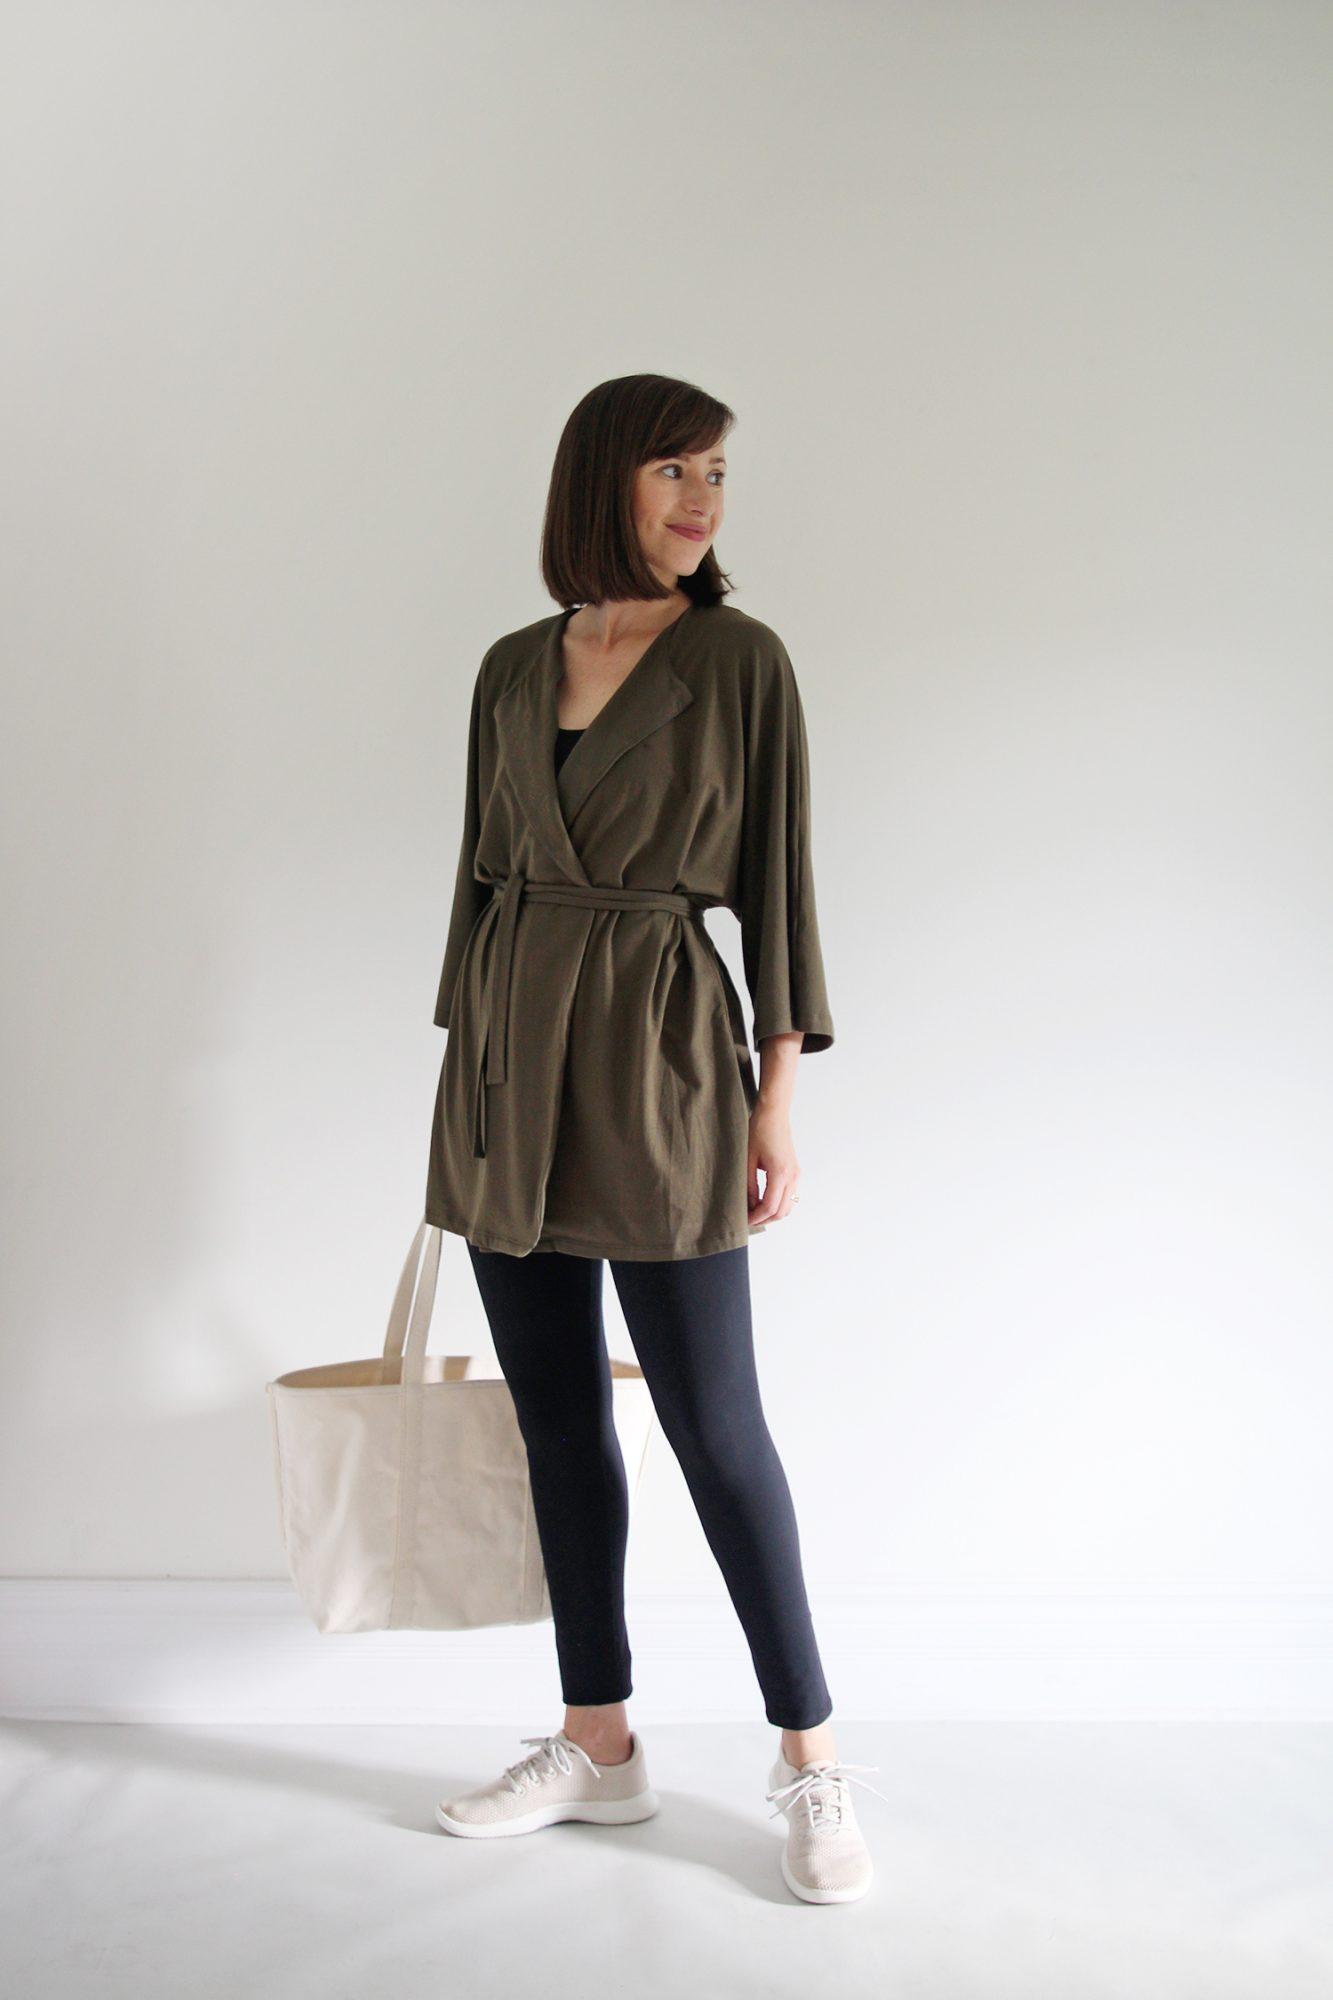 Style Bee - Summer 10x10 - Activewear Edition - Look 3